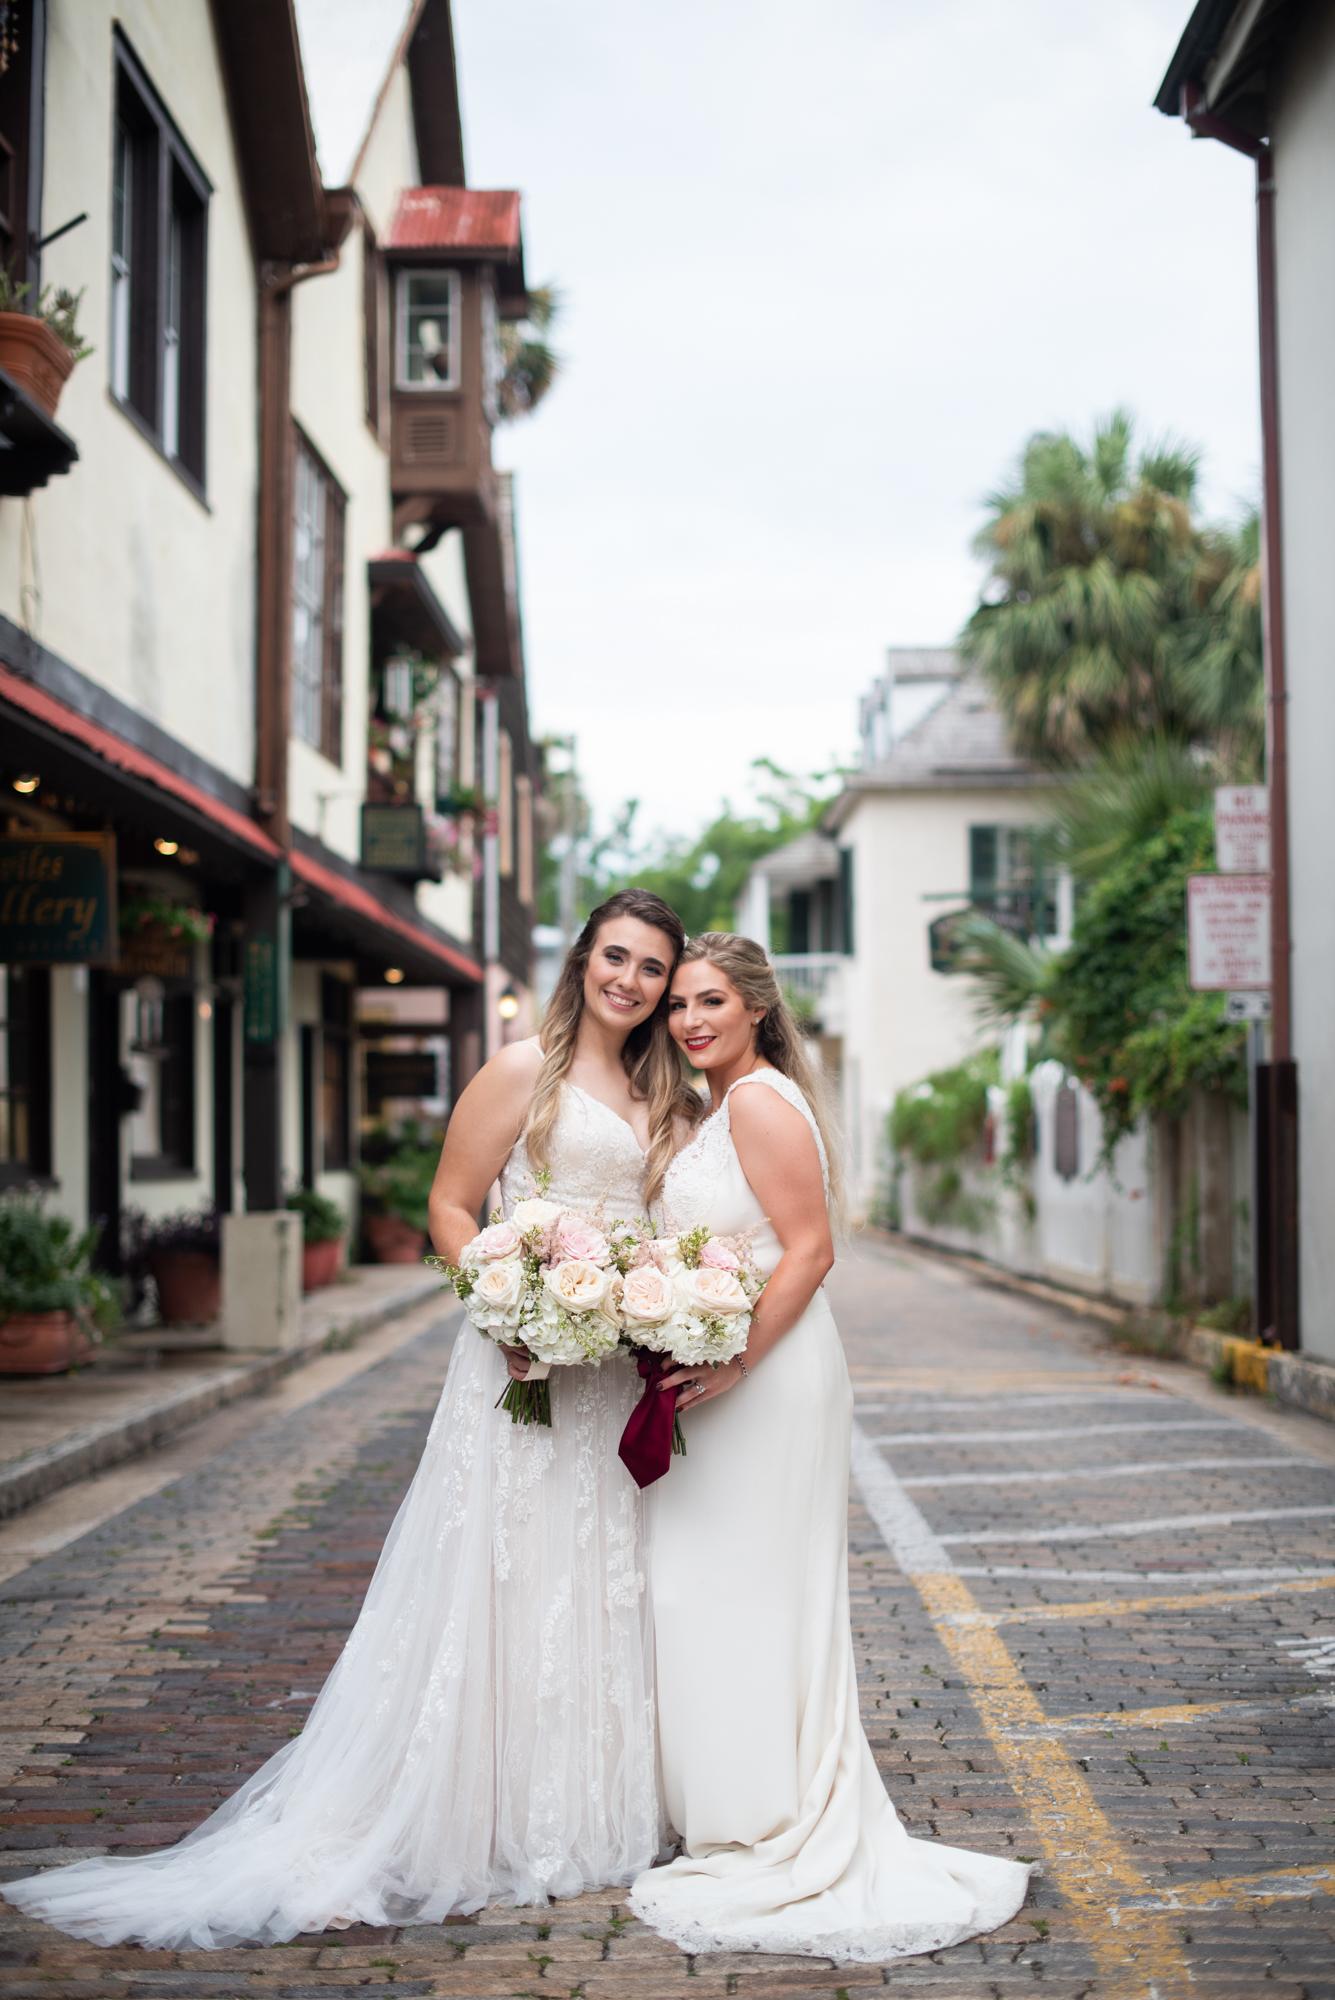 st-augustine-photographer-st-augustine-gay-wedding-sam-sex-wedding-photographer-sarah-annay-photography-white-room-weddings-40.jpg